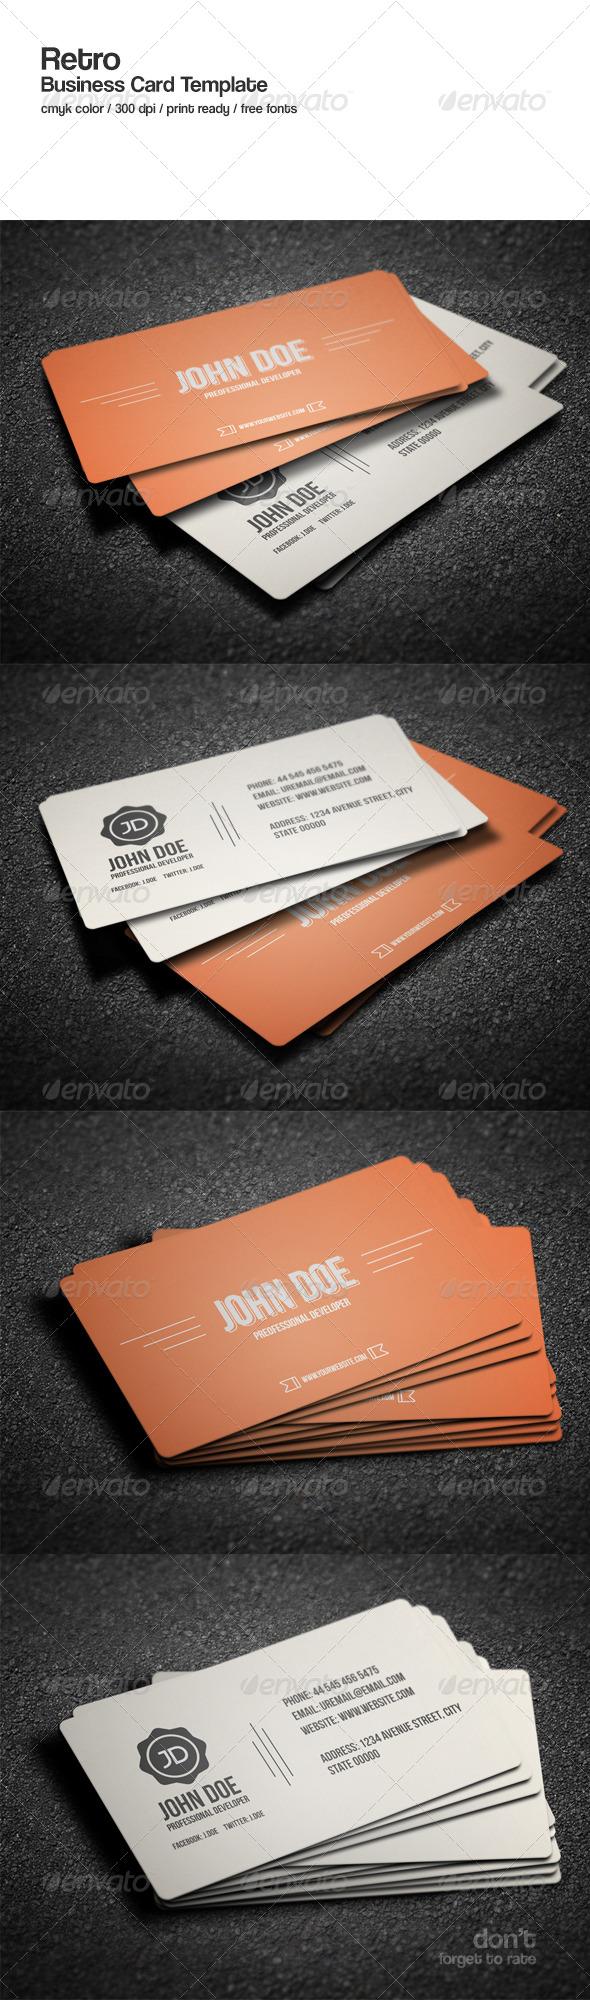 GraphicRiver Retro Business Card Template 8606370